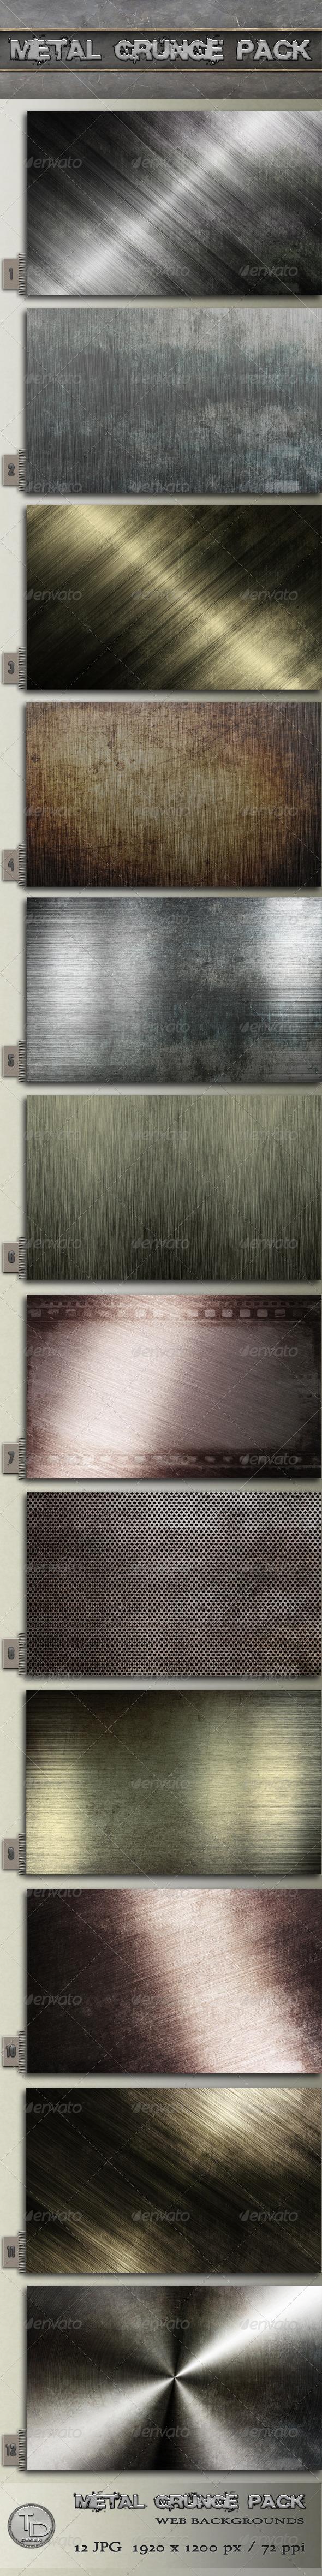 Metal Grunge Pack by AzureRayArt